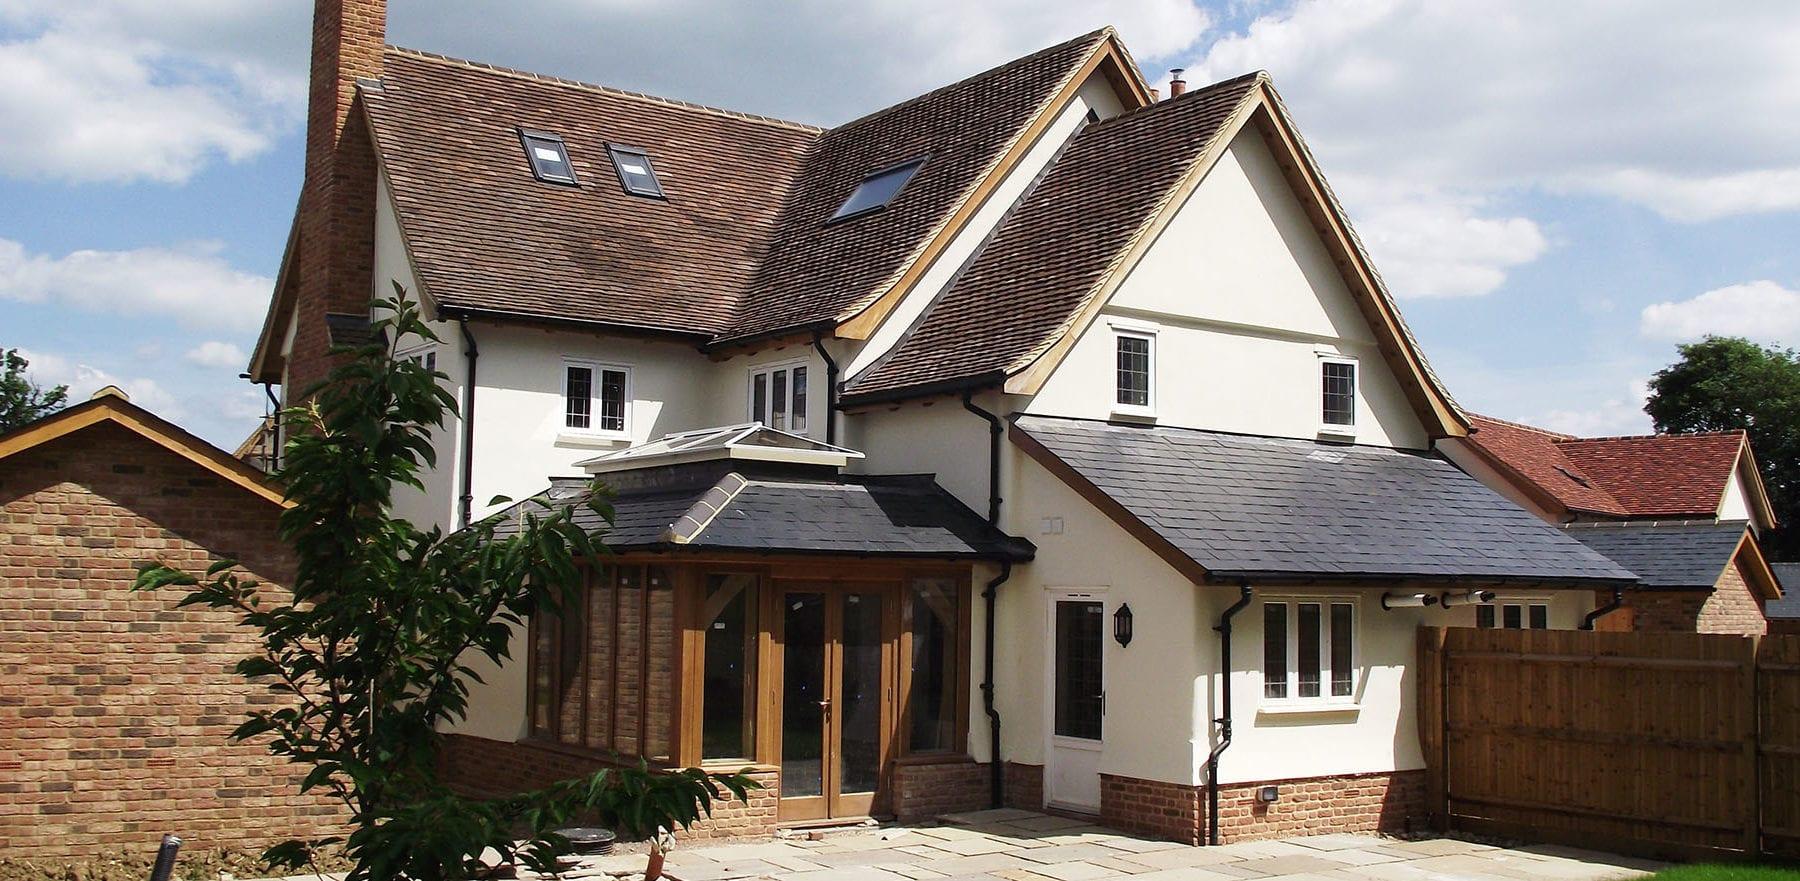 Lifestiles - Handmade Restoration Clay Roof Tiles - Manuden, England 3